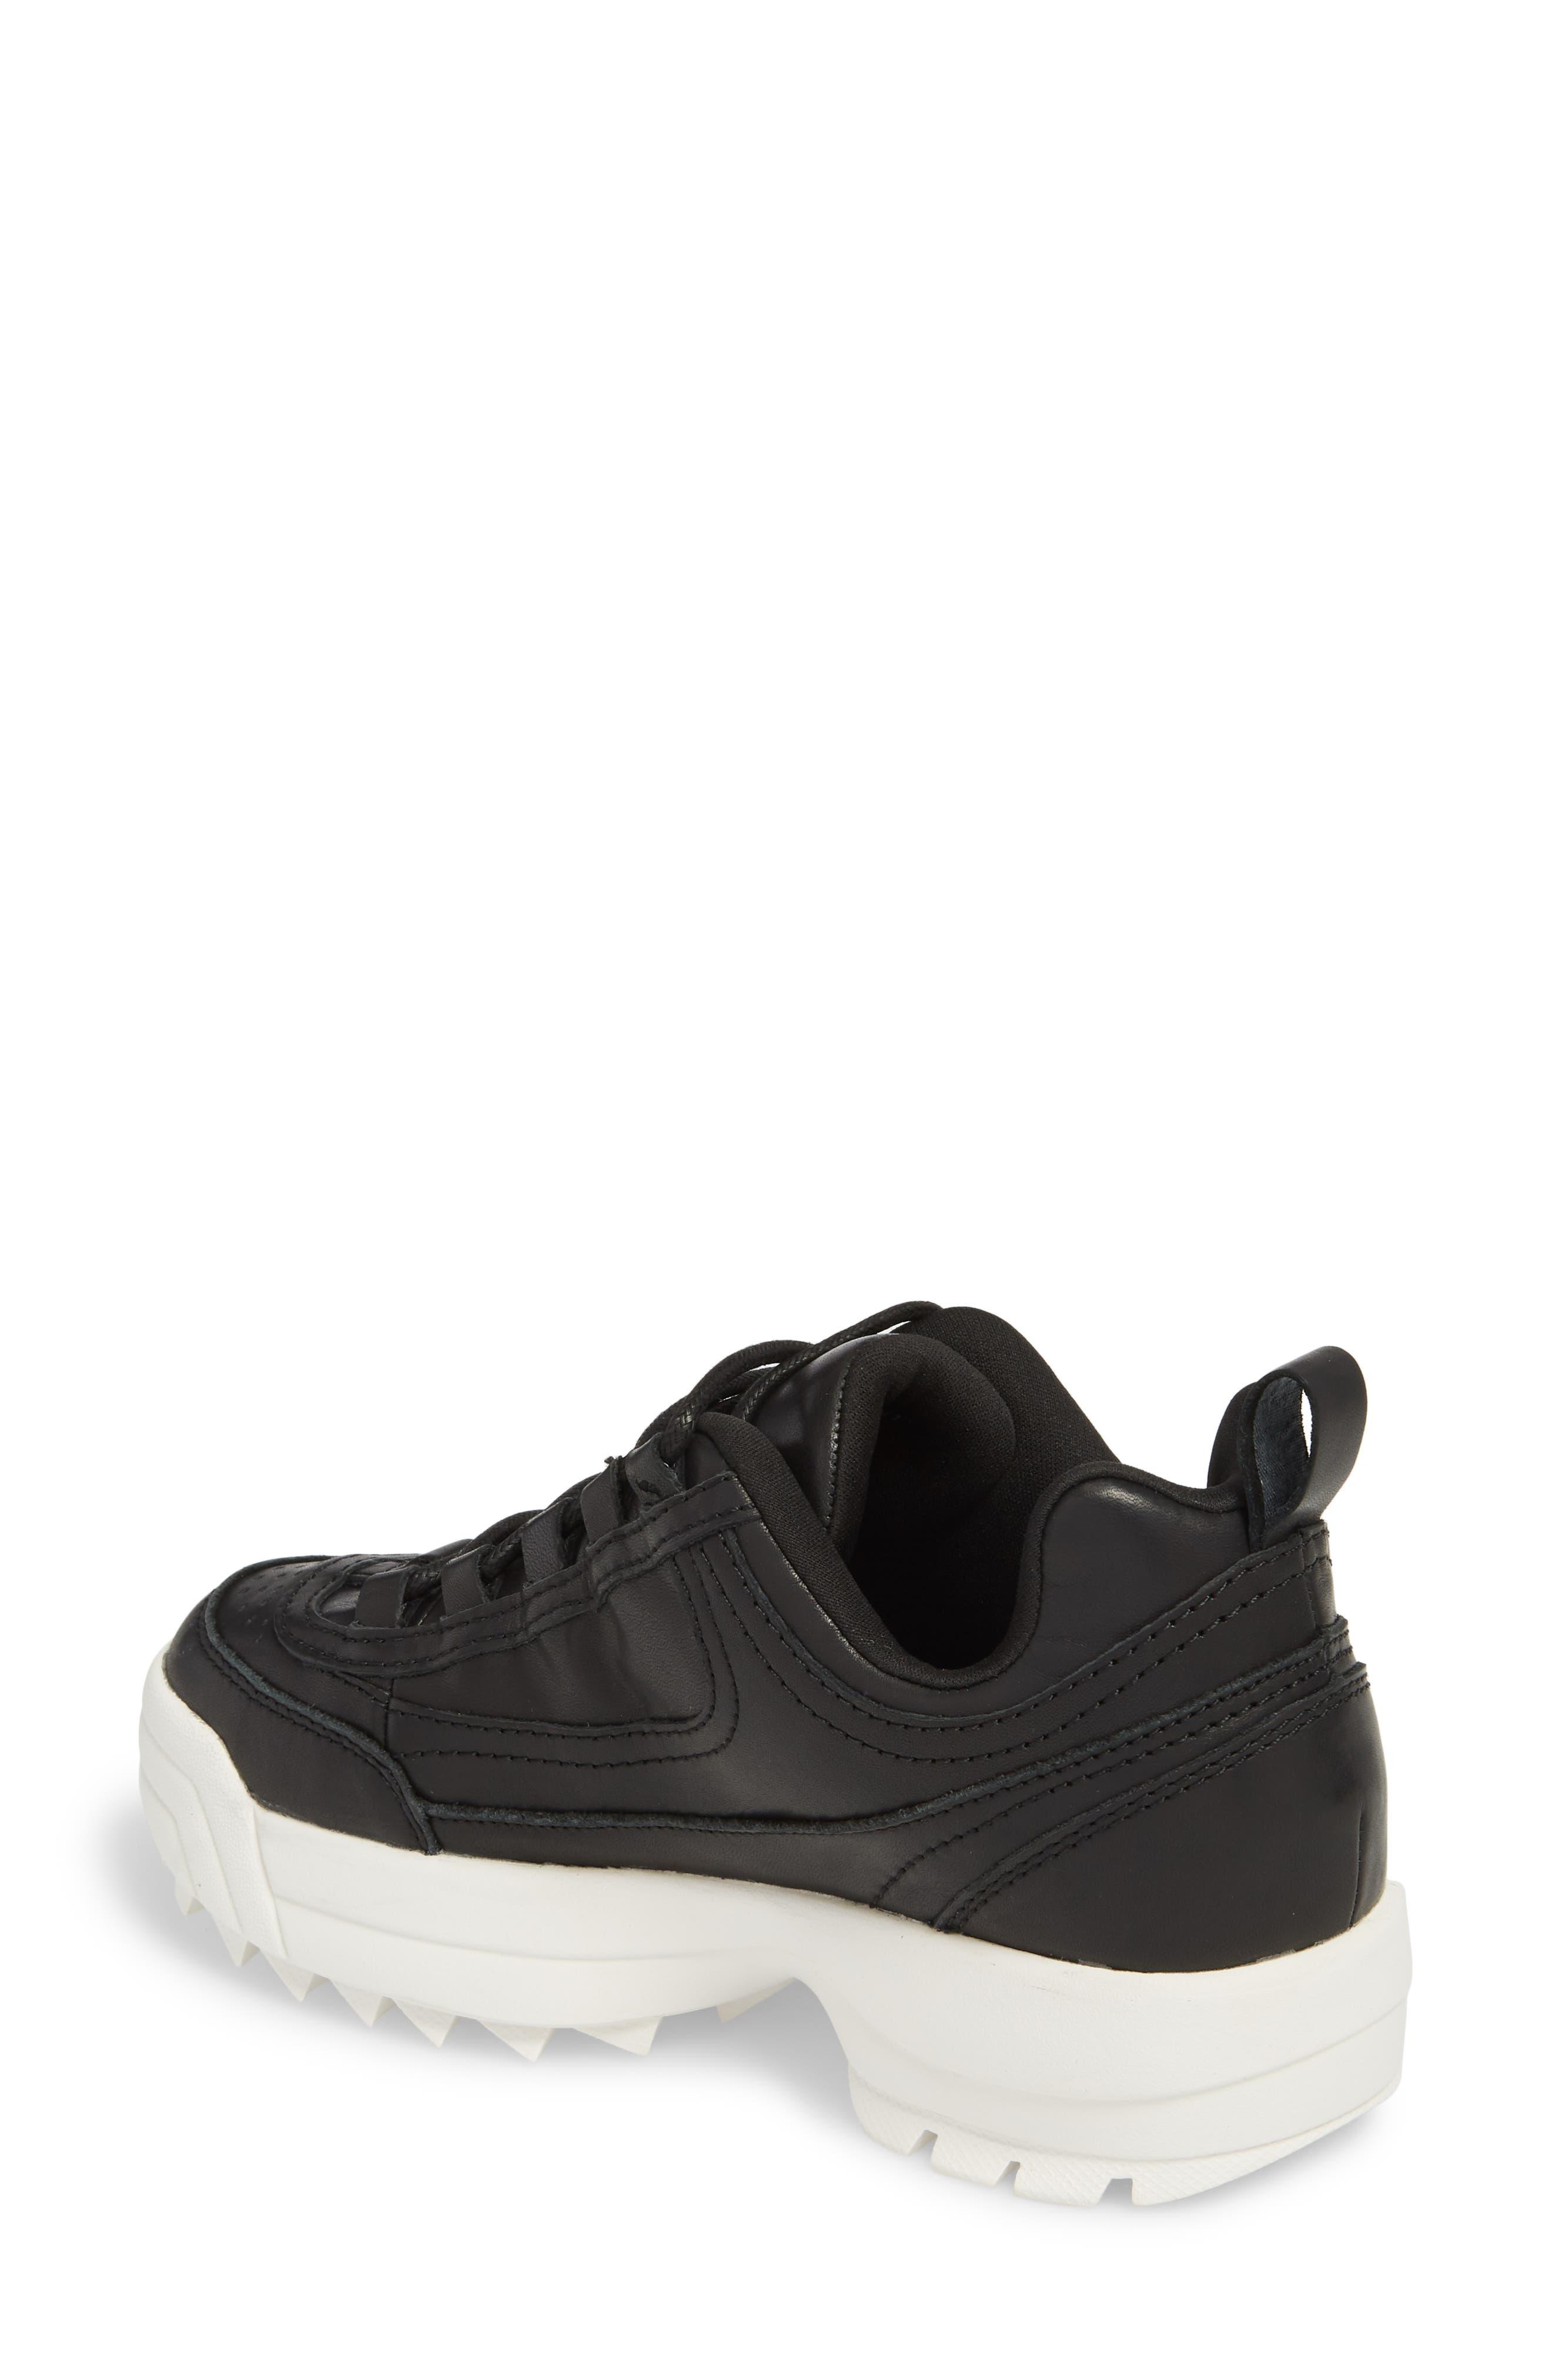 Sidekick Platform Sneaker,                             Alternate thumbnail 2, color,                             Black Leather